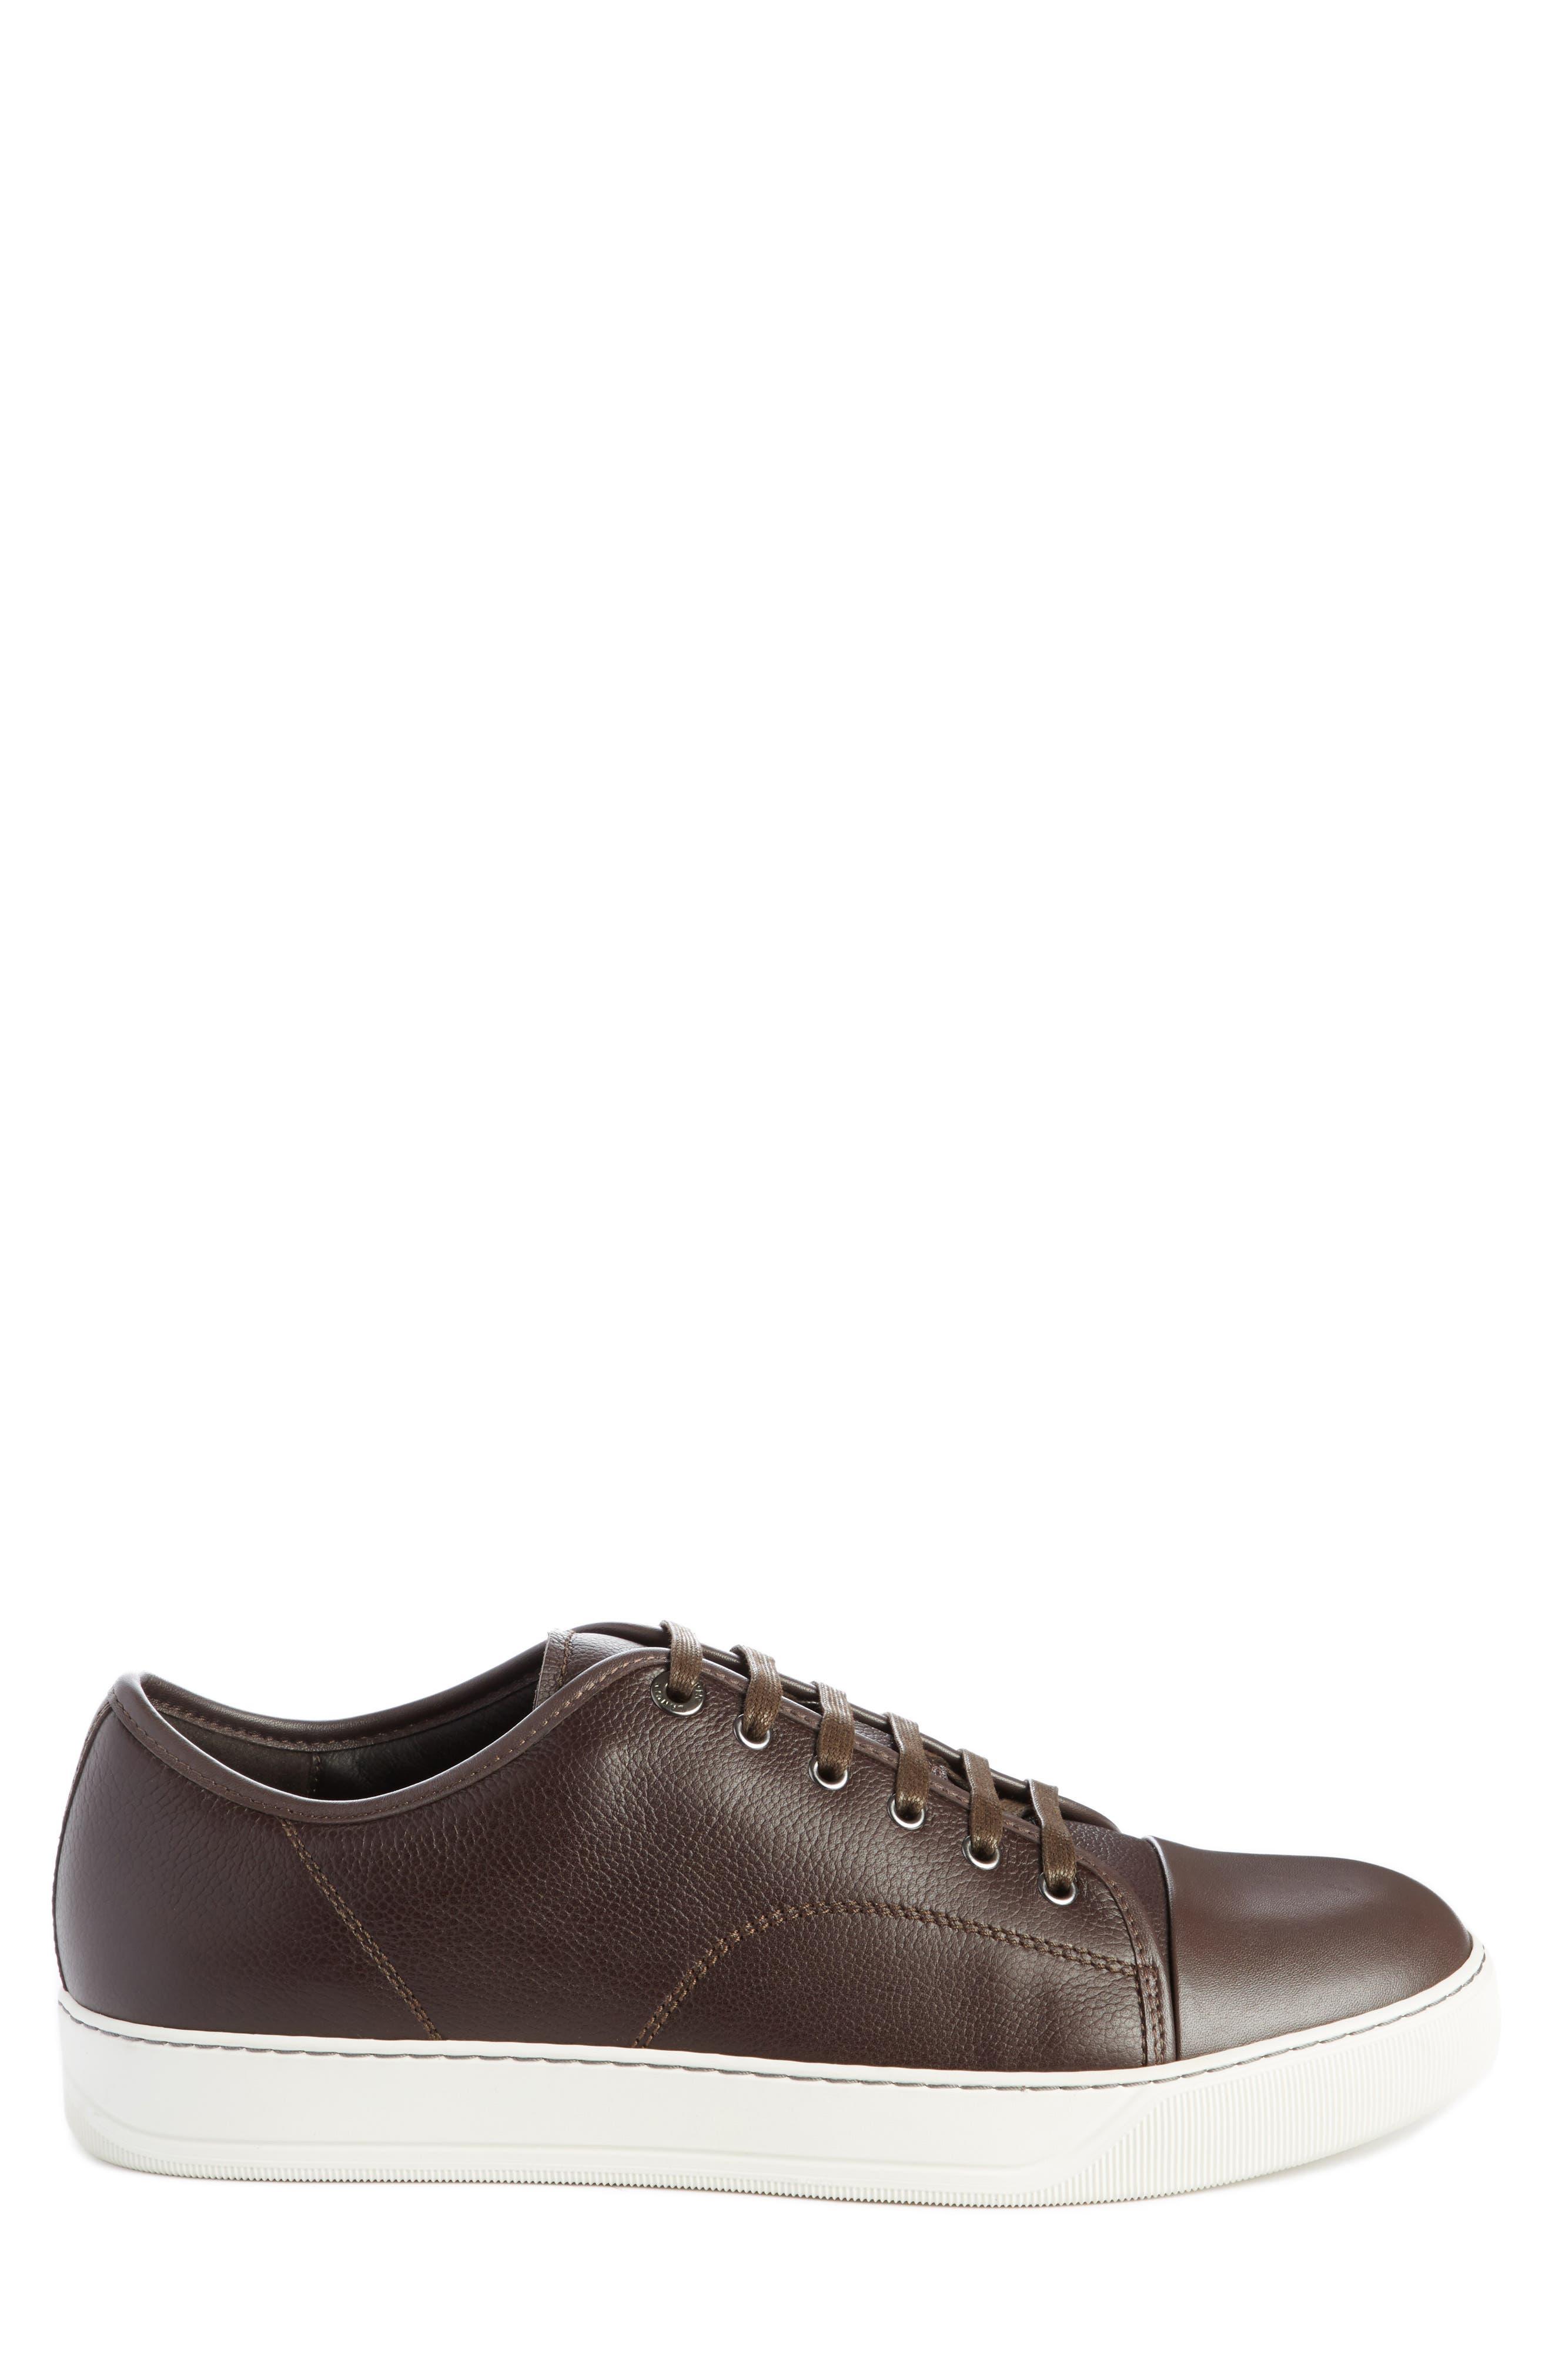 Alternate Image 3  - Lanvin Shiny Cap Toe Sneaker (Men)